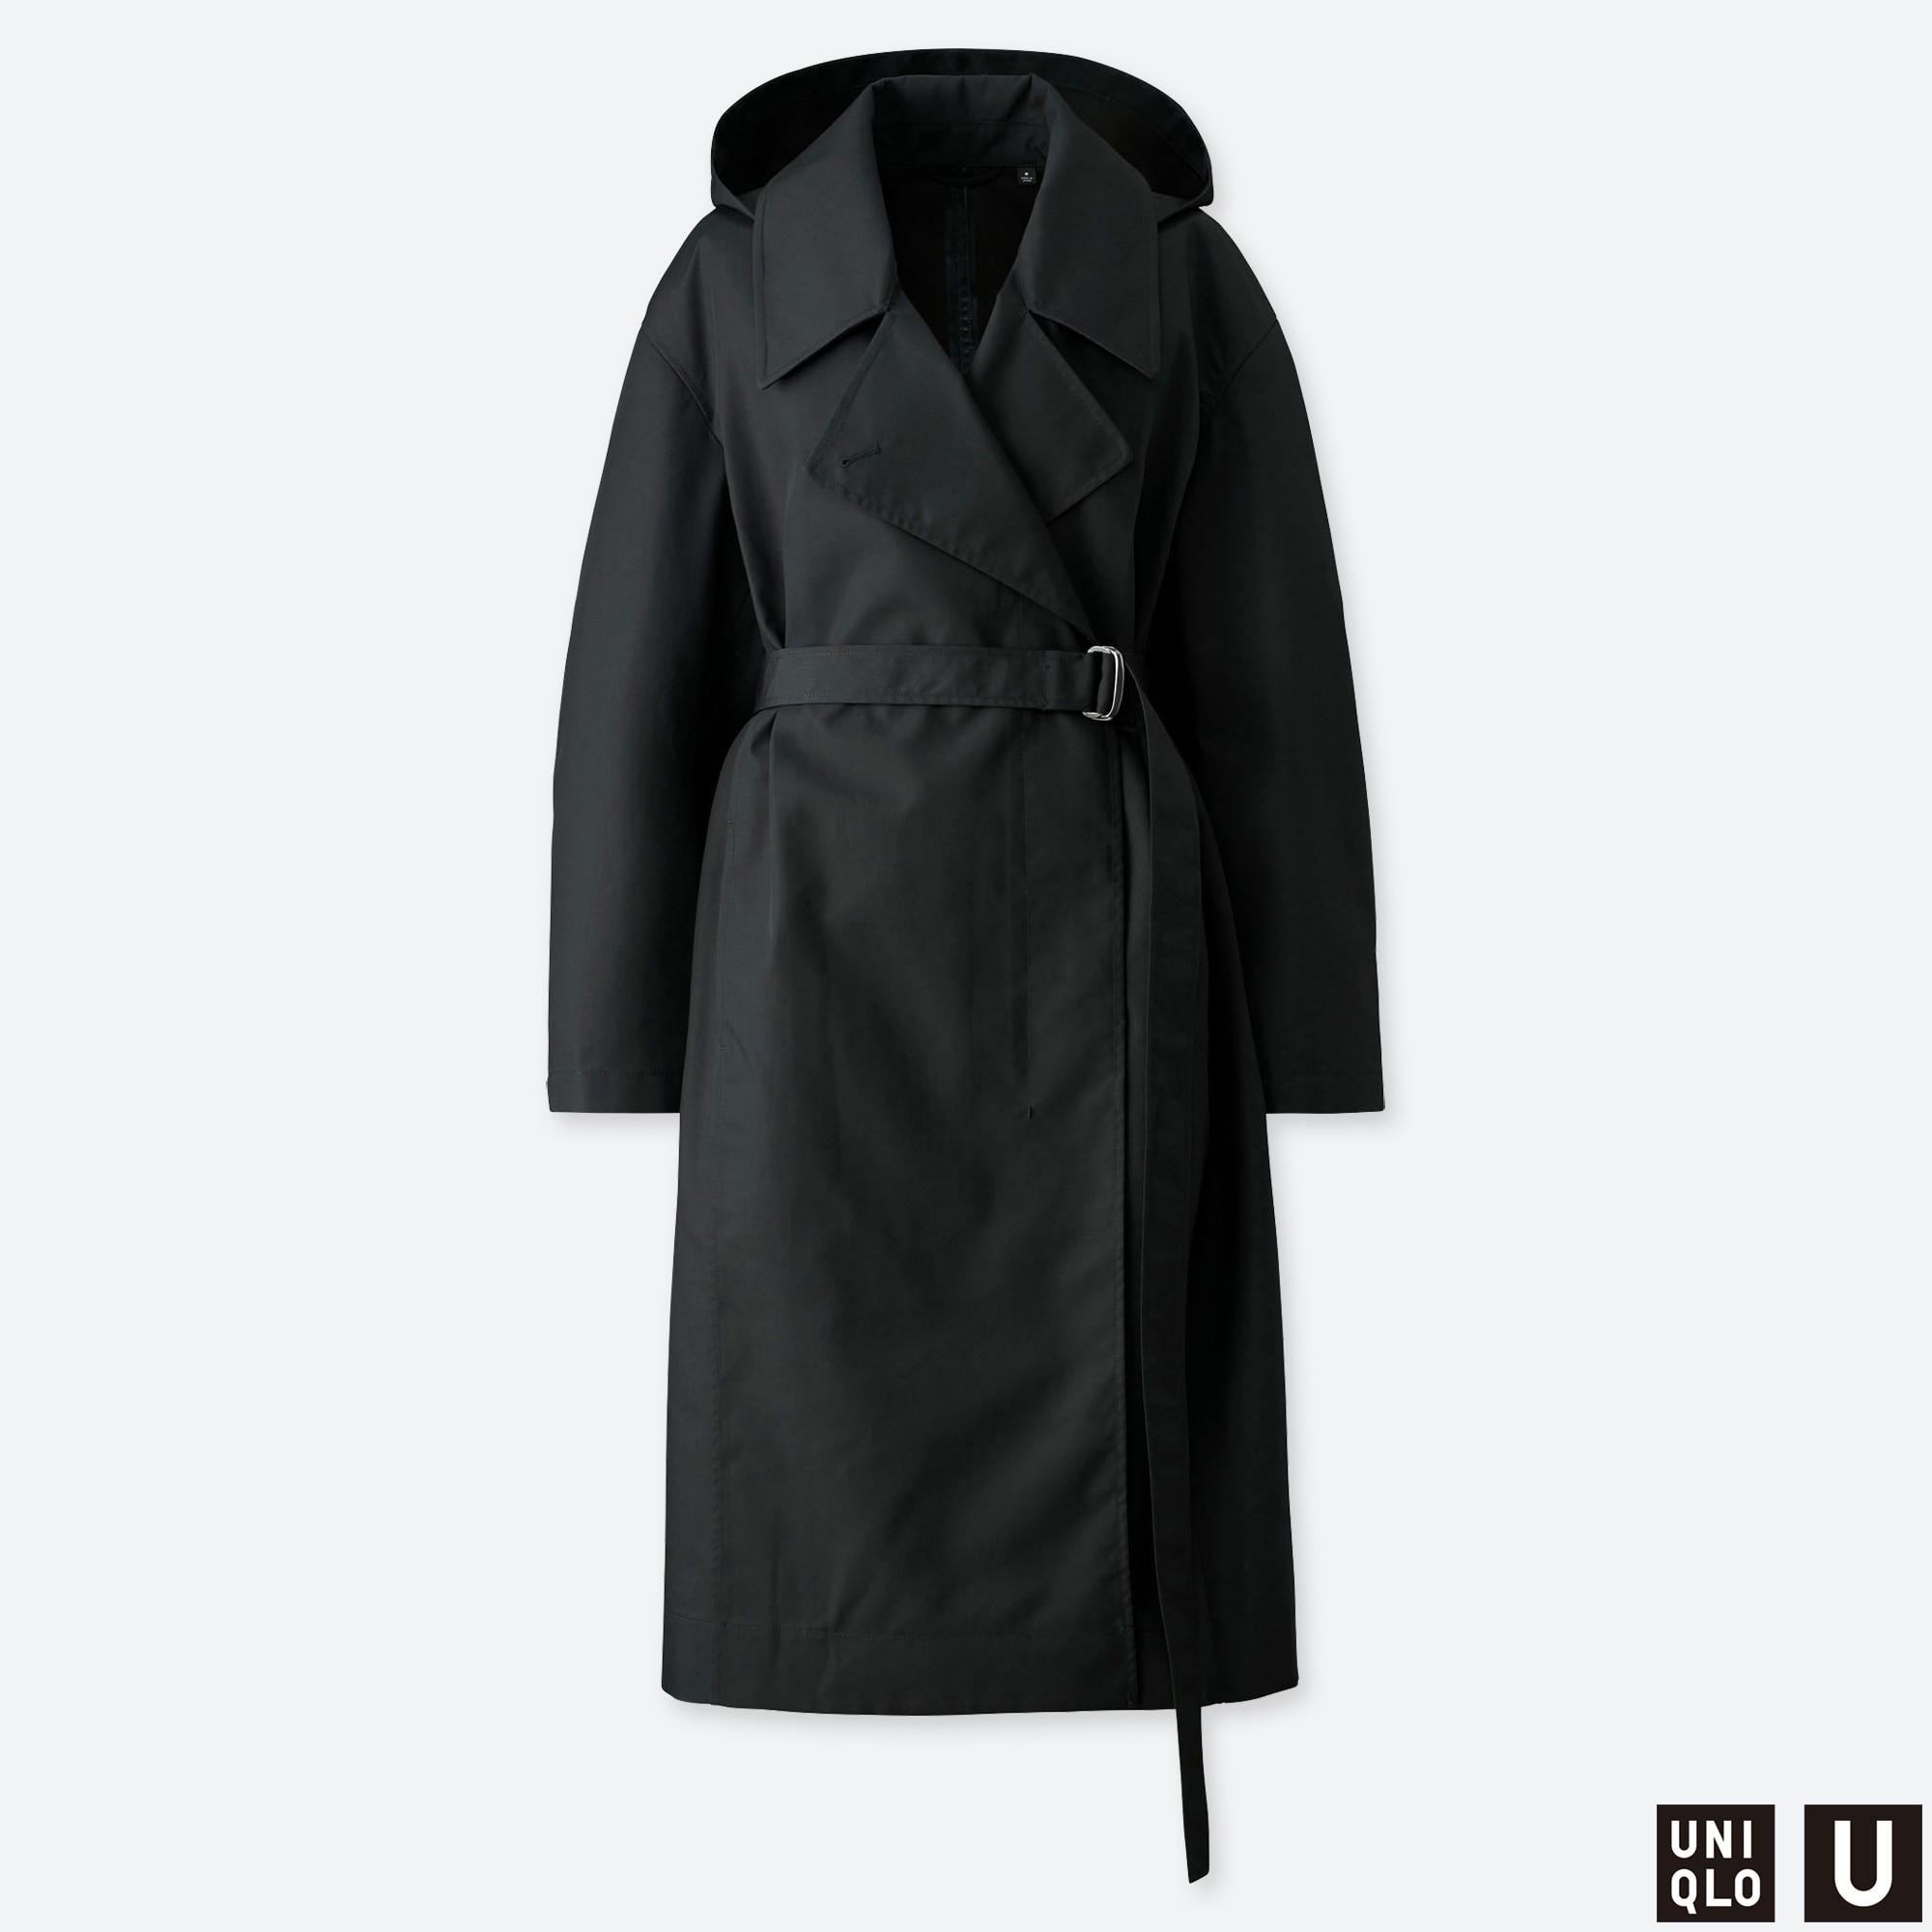 DAMEN U BLOCKTECH MANTEL | Uniqlo women outfit, Uniqlo, Coat